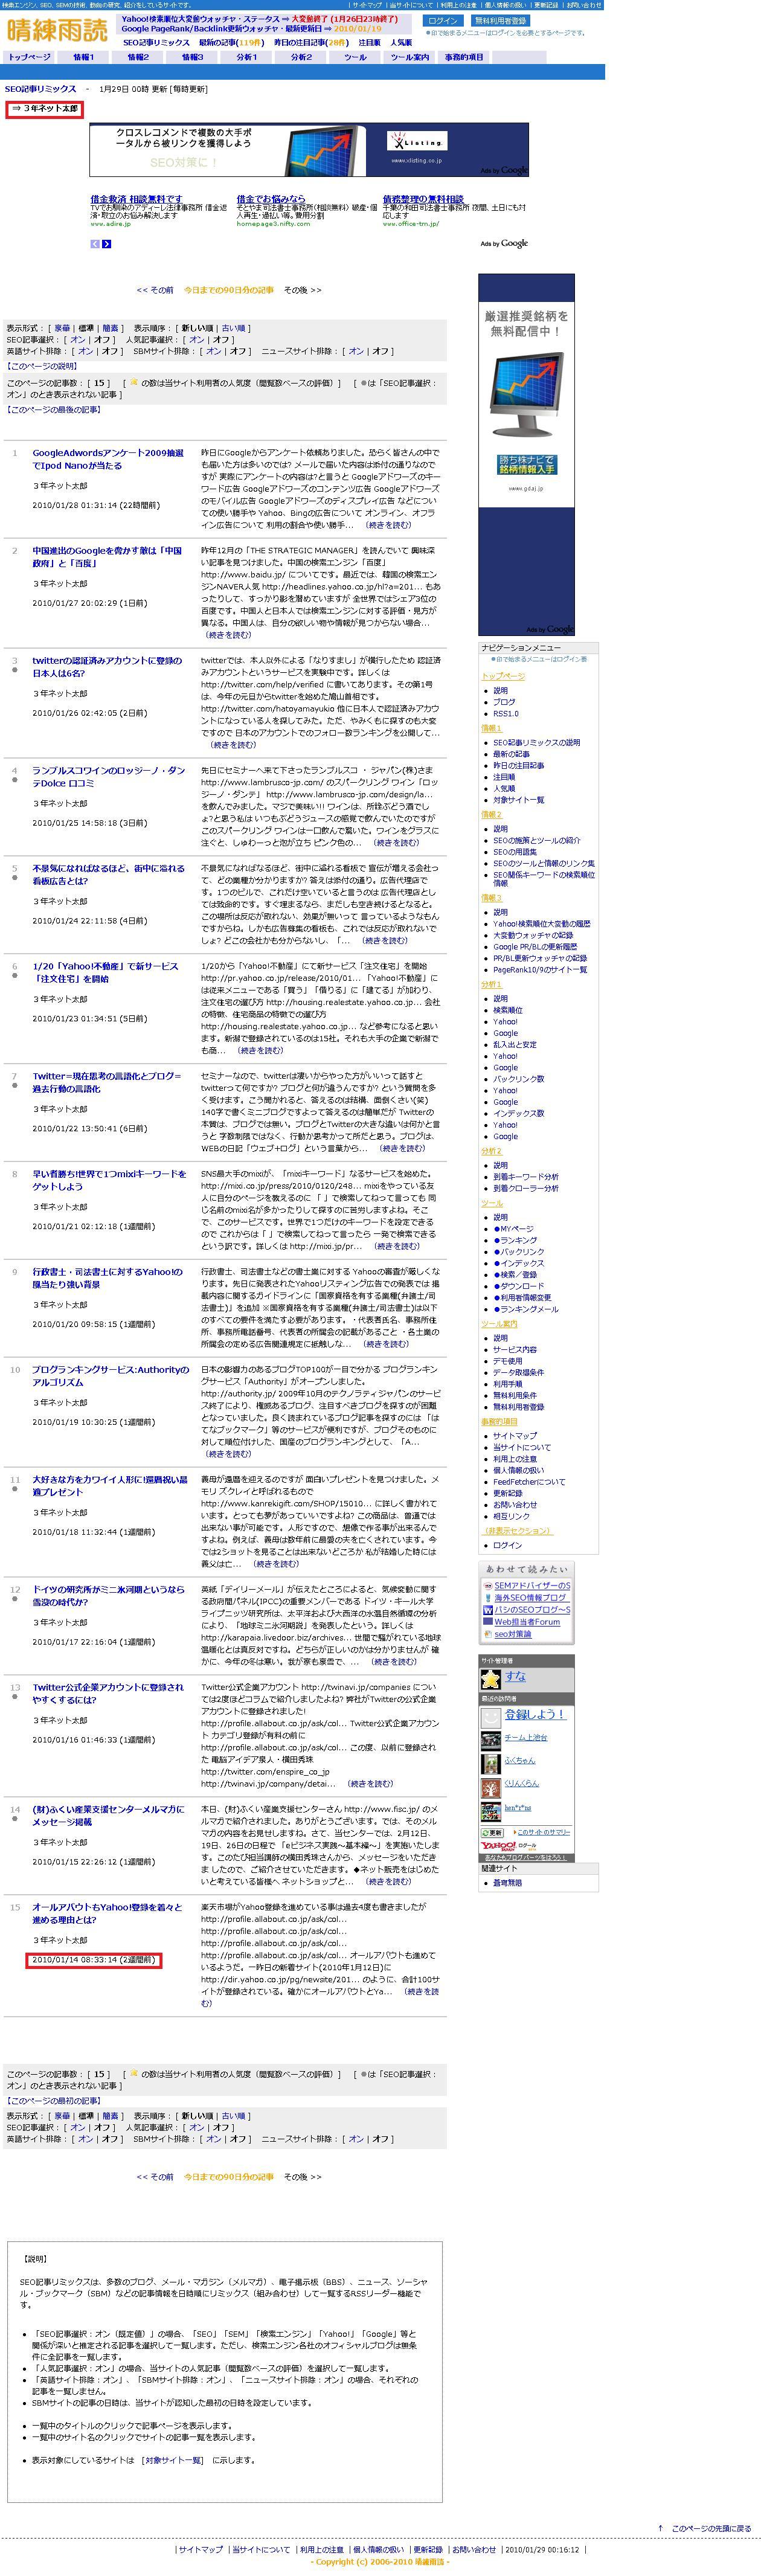 SEO情報を網羅した晴練雨読に3年ネット太郎が登録